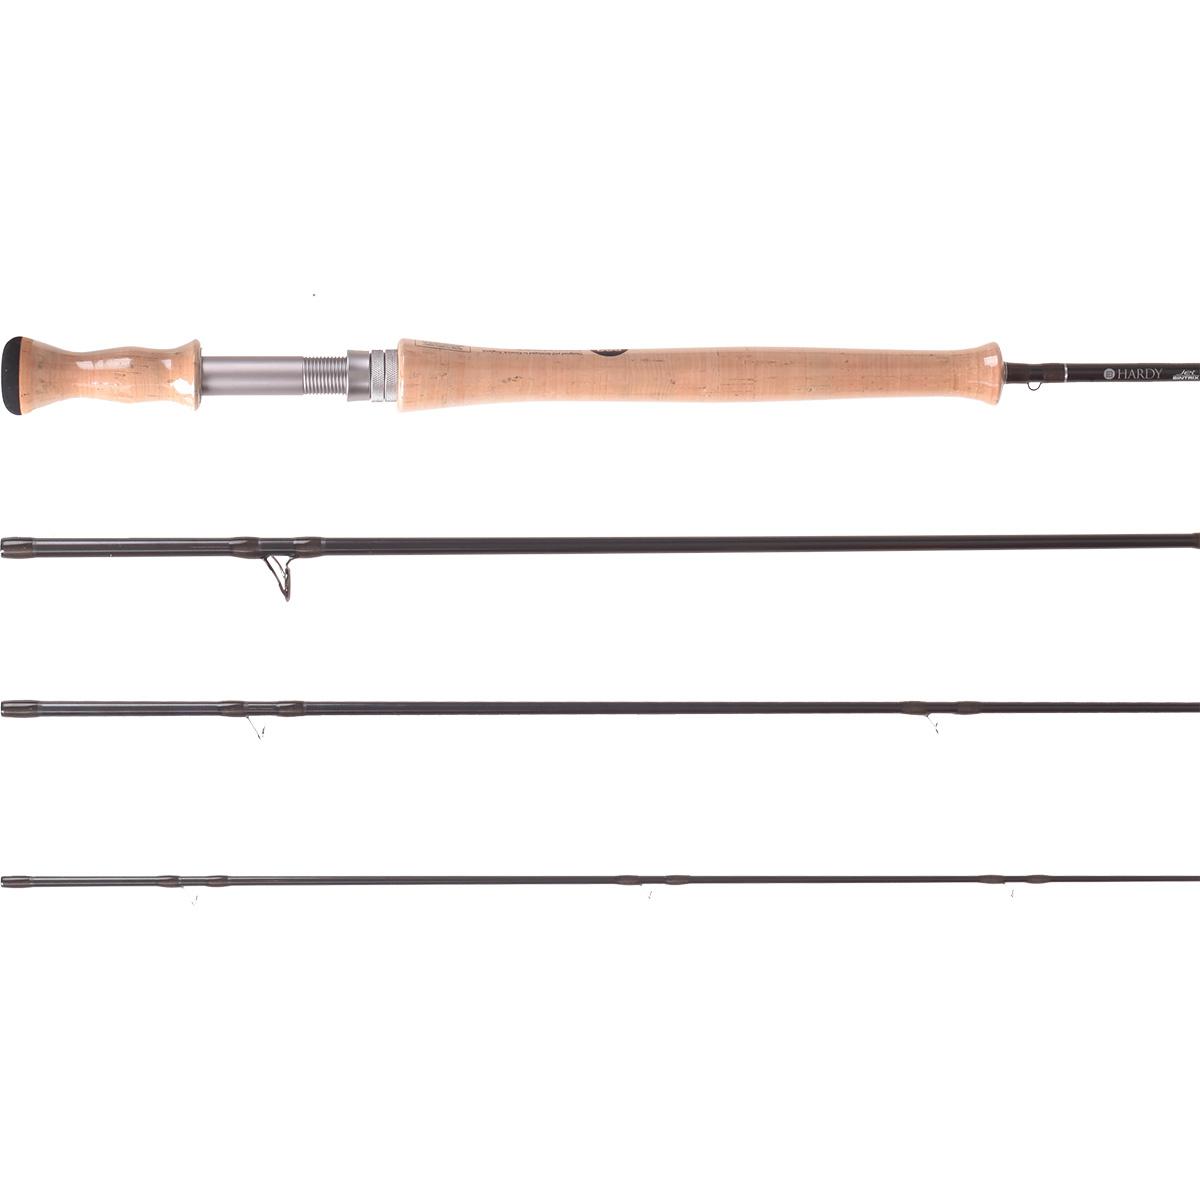 Hardy jet aws switch fly fishing rods ebay for Ebay fly fishing